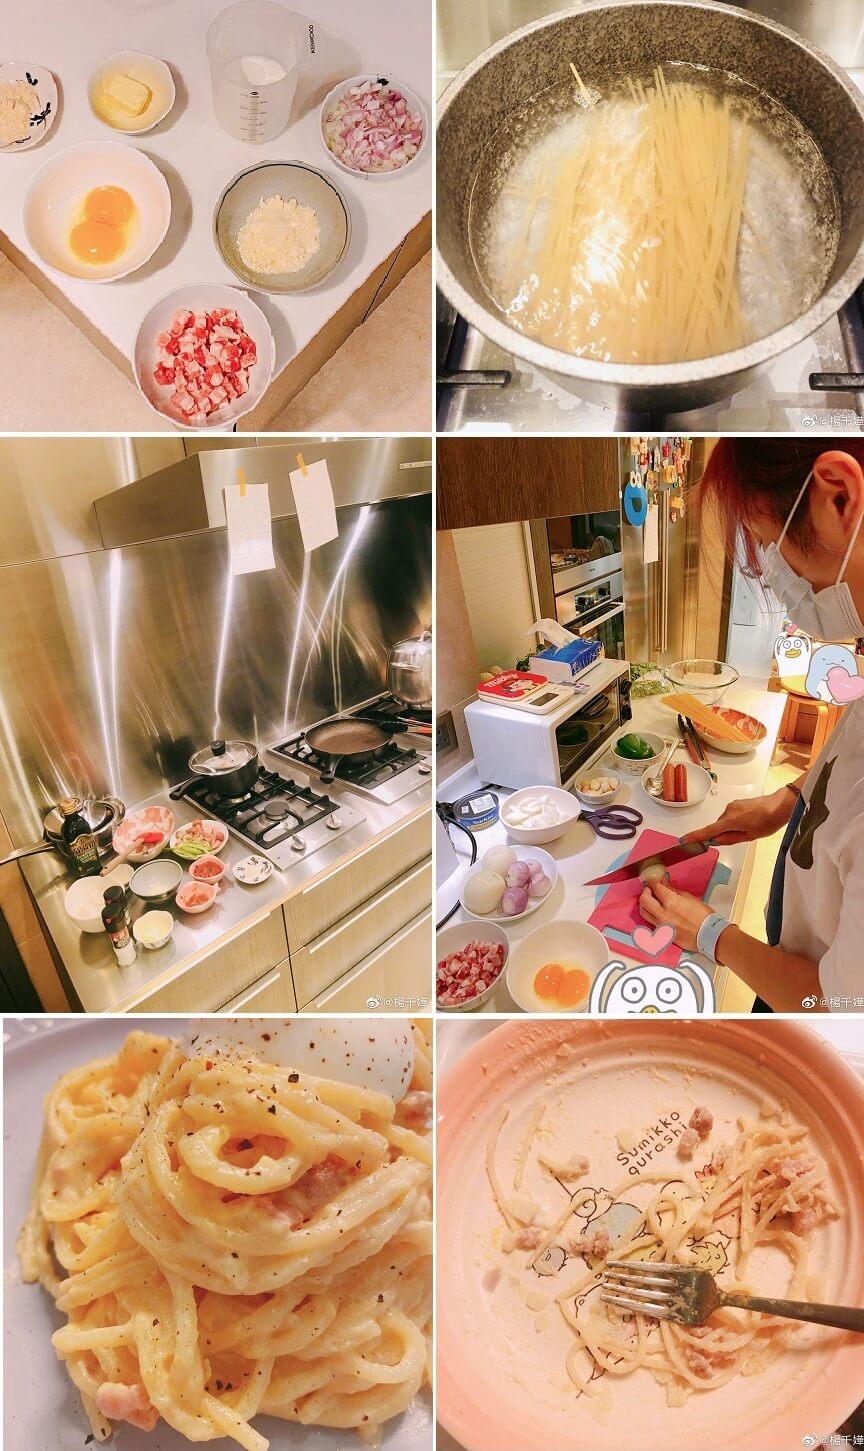 千嬅煮的煙肉奶油意大利麵,獲Torres大讚:「Ma Ma u are so amazing. u can cook !!!」